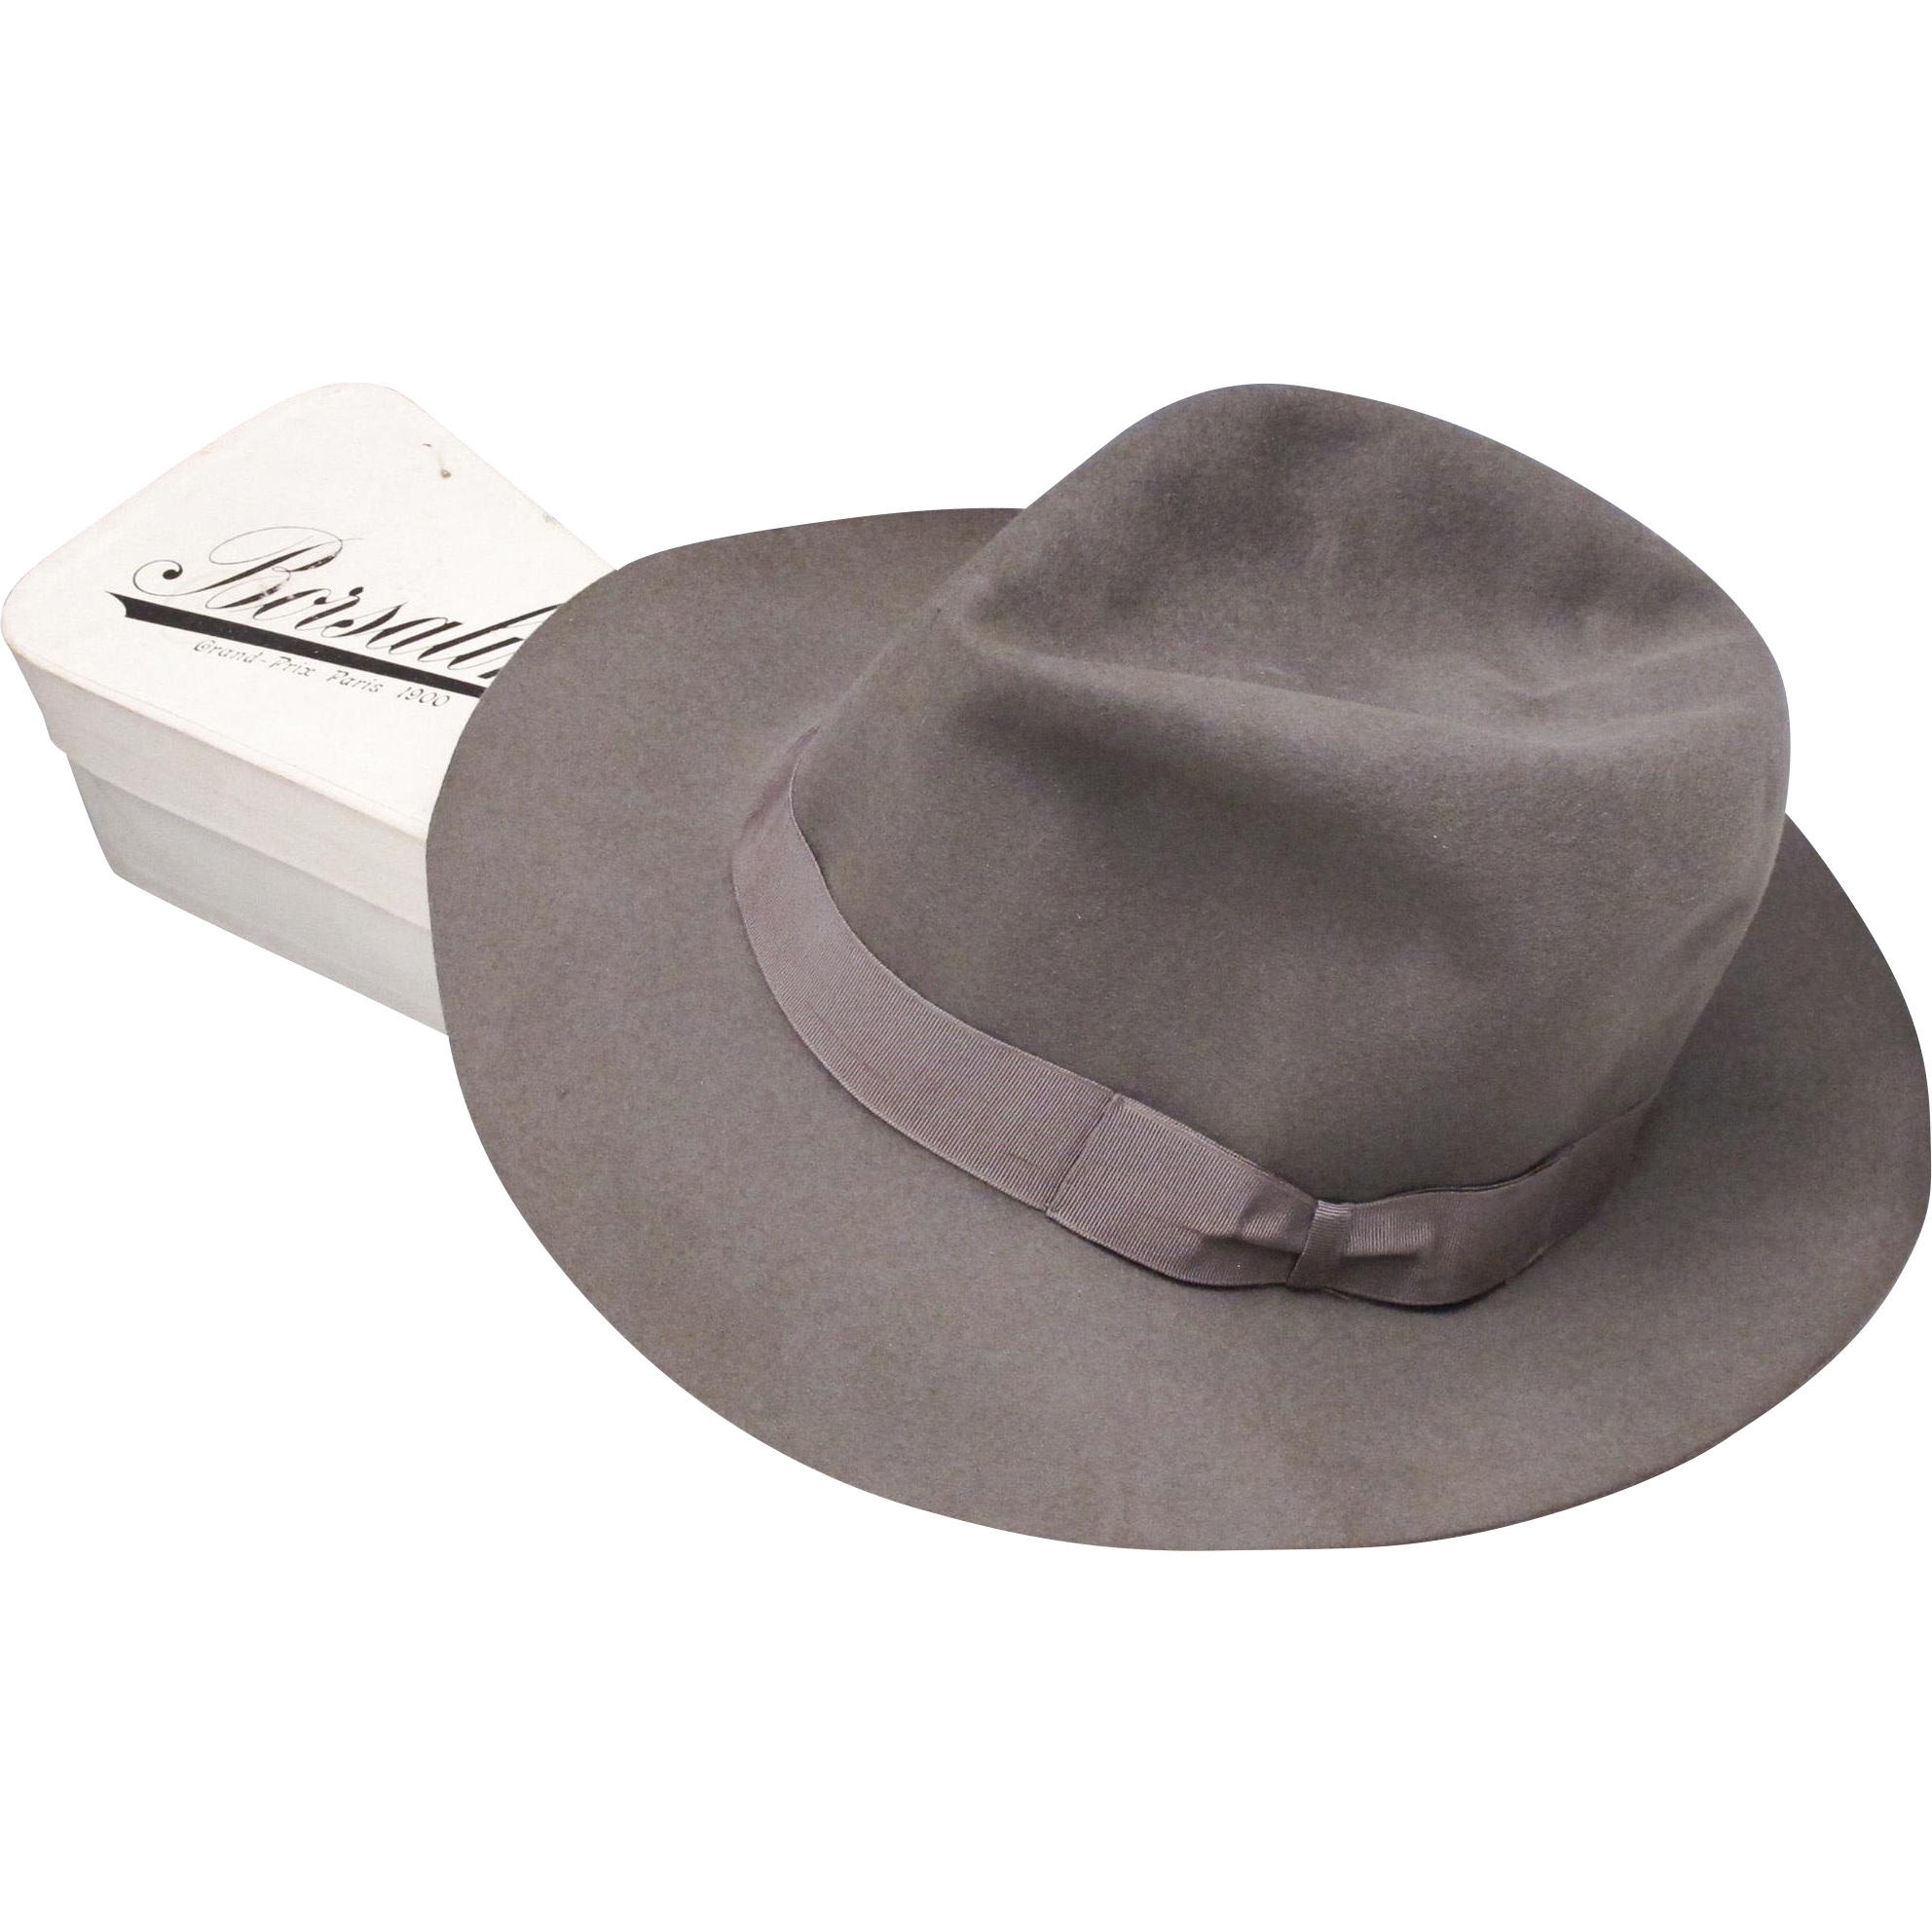 2469d683237 Vintage Borsalino Fedora Hat - Feather Weight - Rolled in Original Box -  Rollable  rubylane  50shadesofgrey